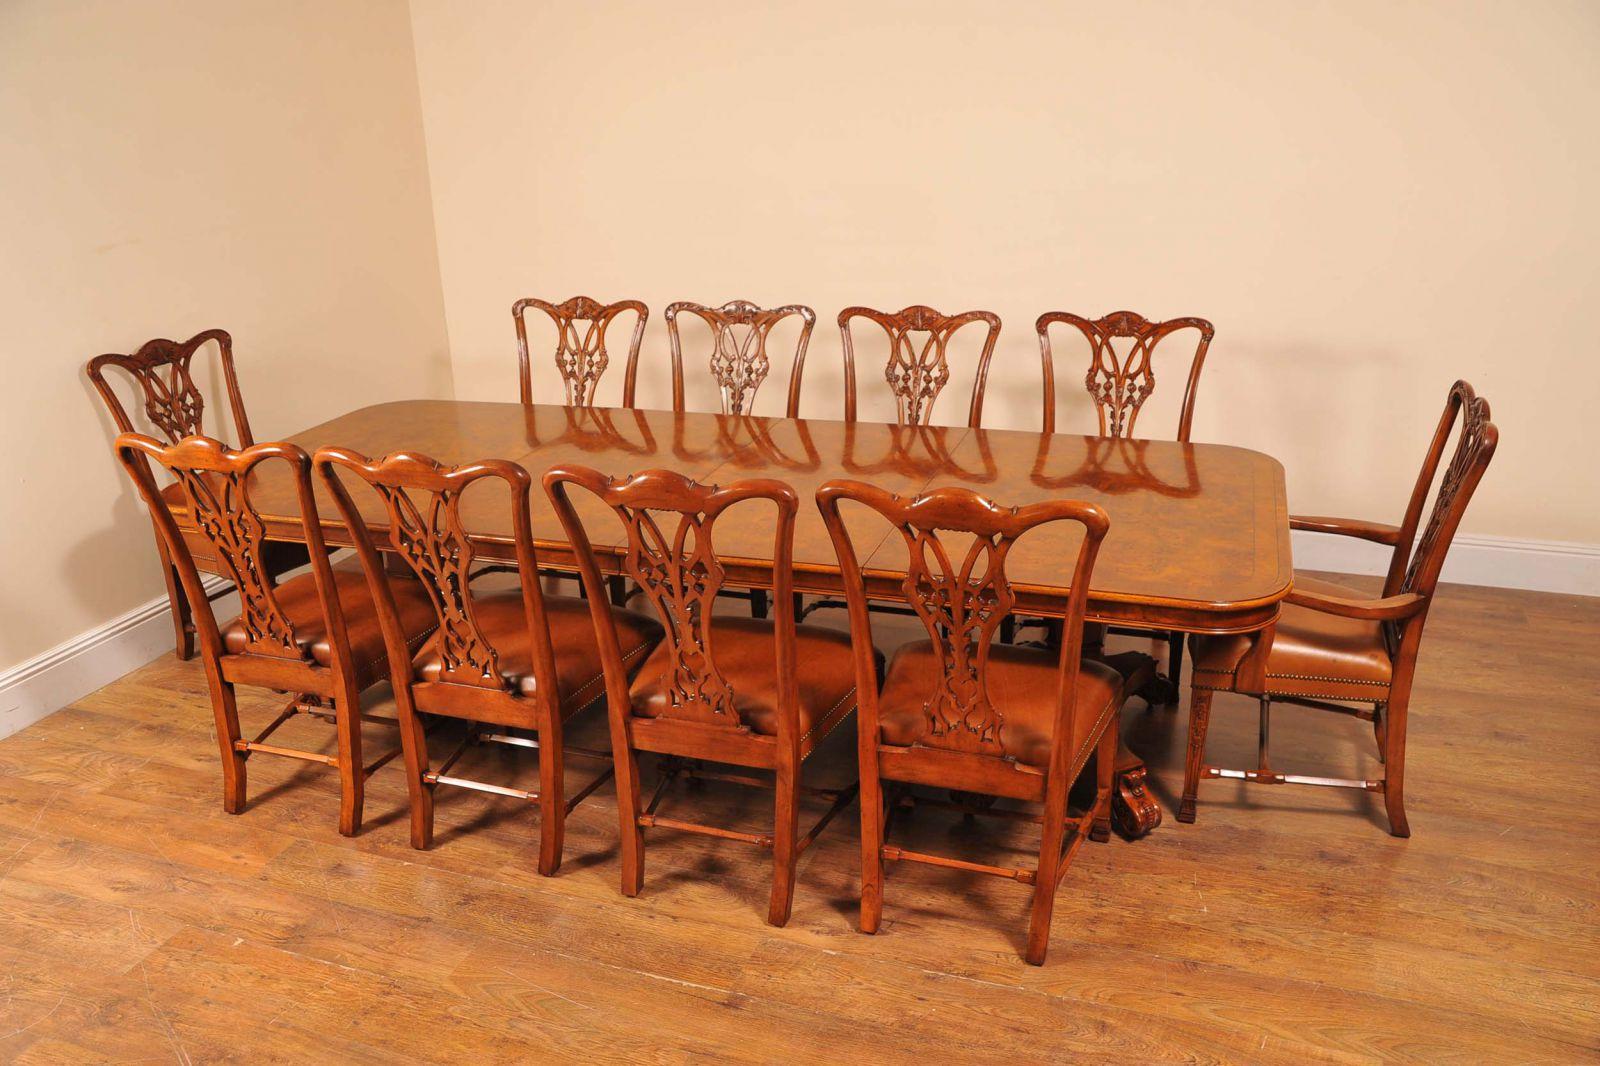 Esszimmer Stuhle Chippendale Finden Sie Hohe Qualitat Chippendale